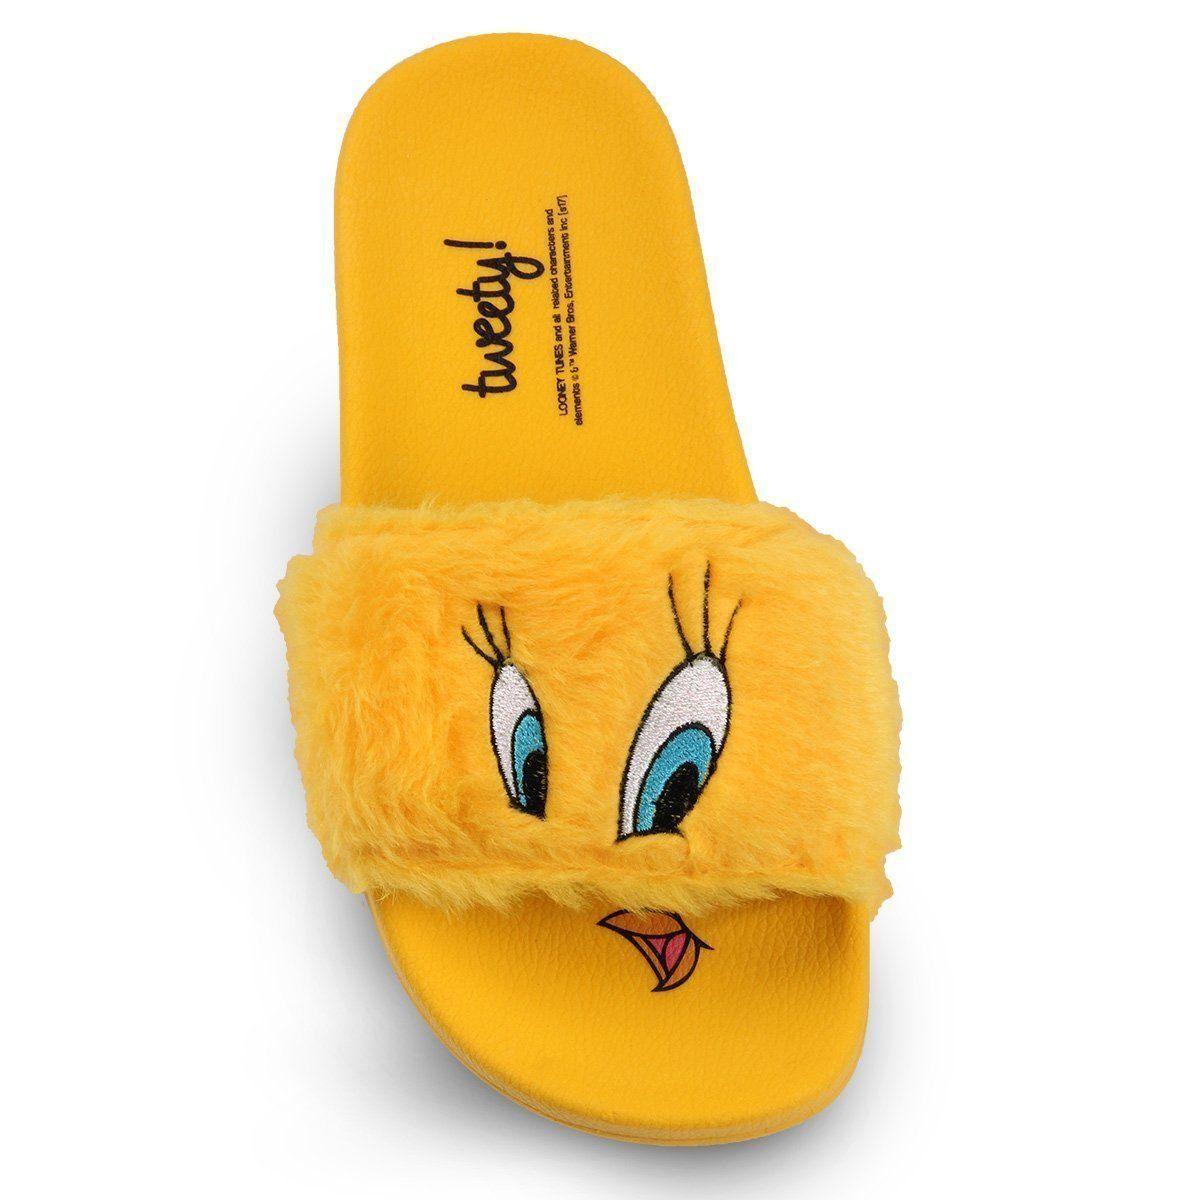 Chinelo Slide Looney Tunes Piu-Piu  - bandUP Store Marketplace